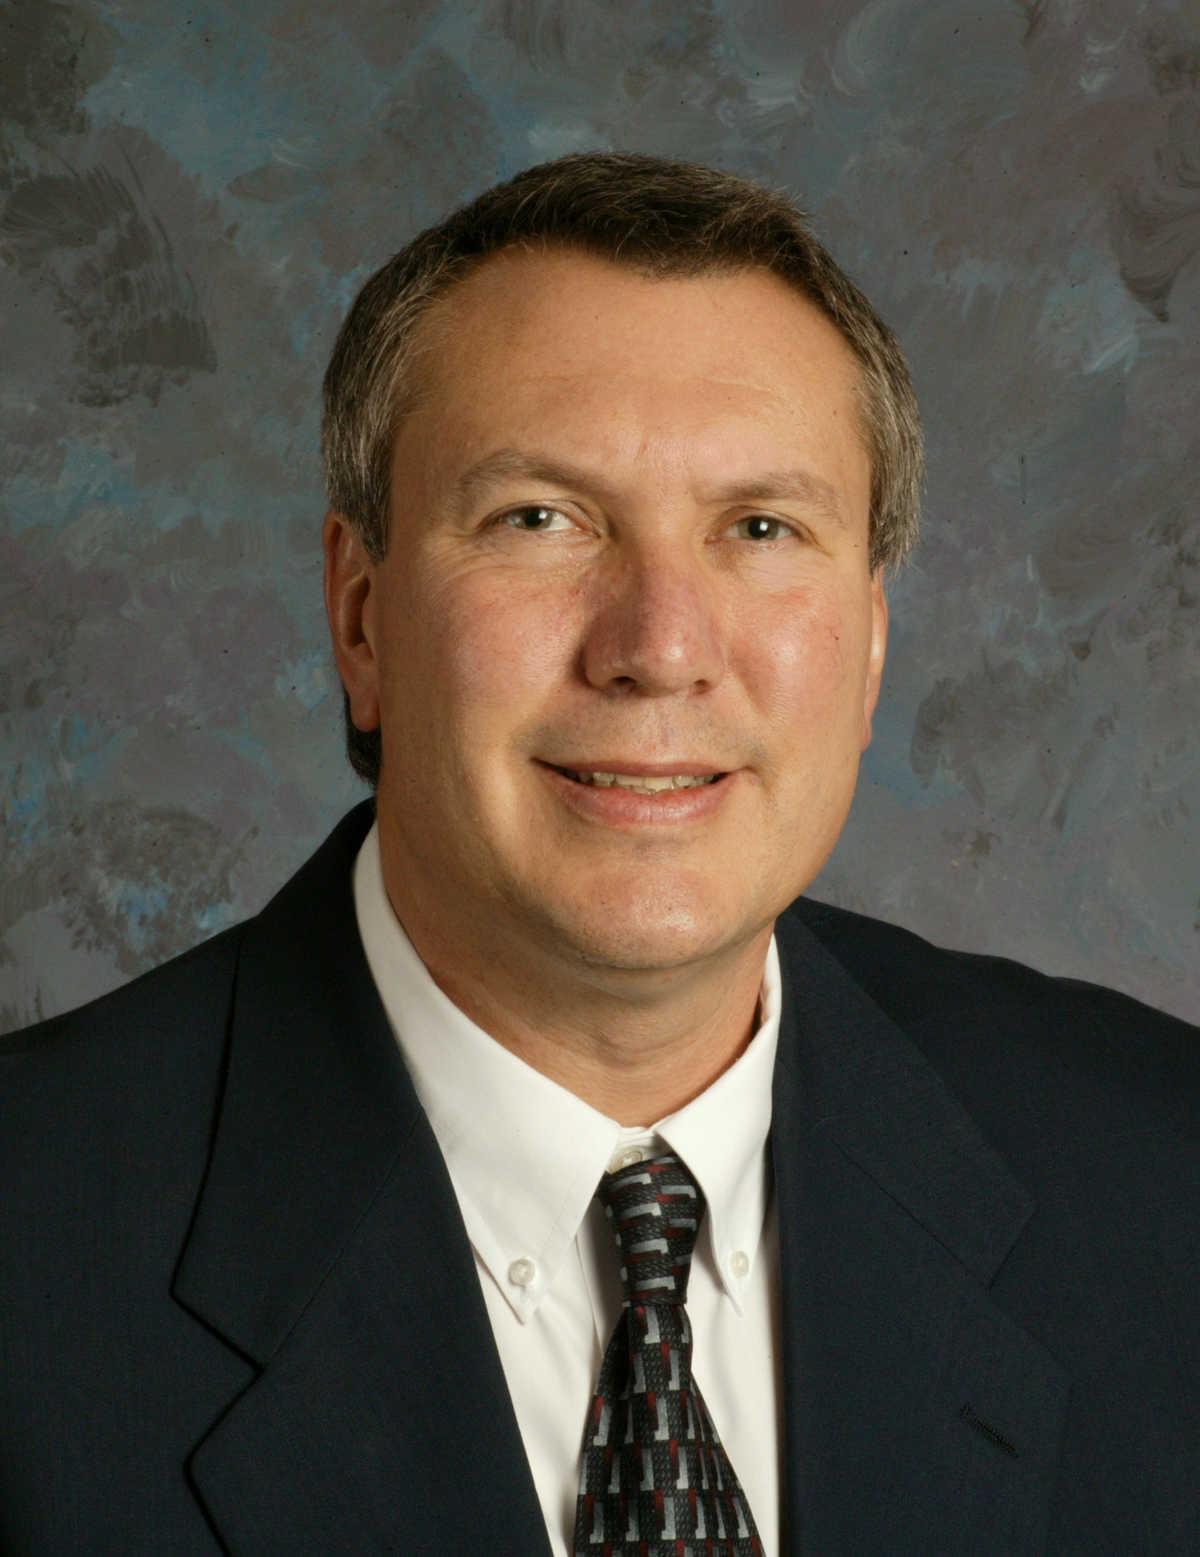 Dr. David J. McComas